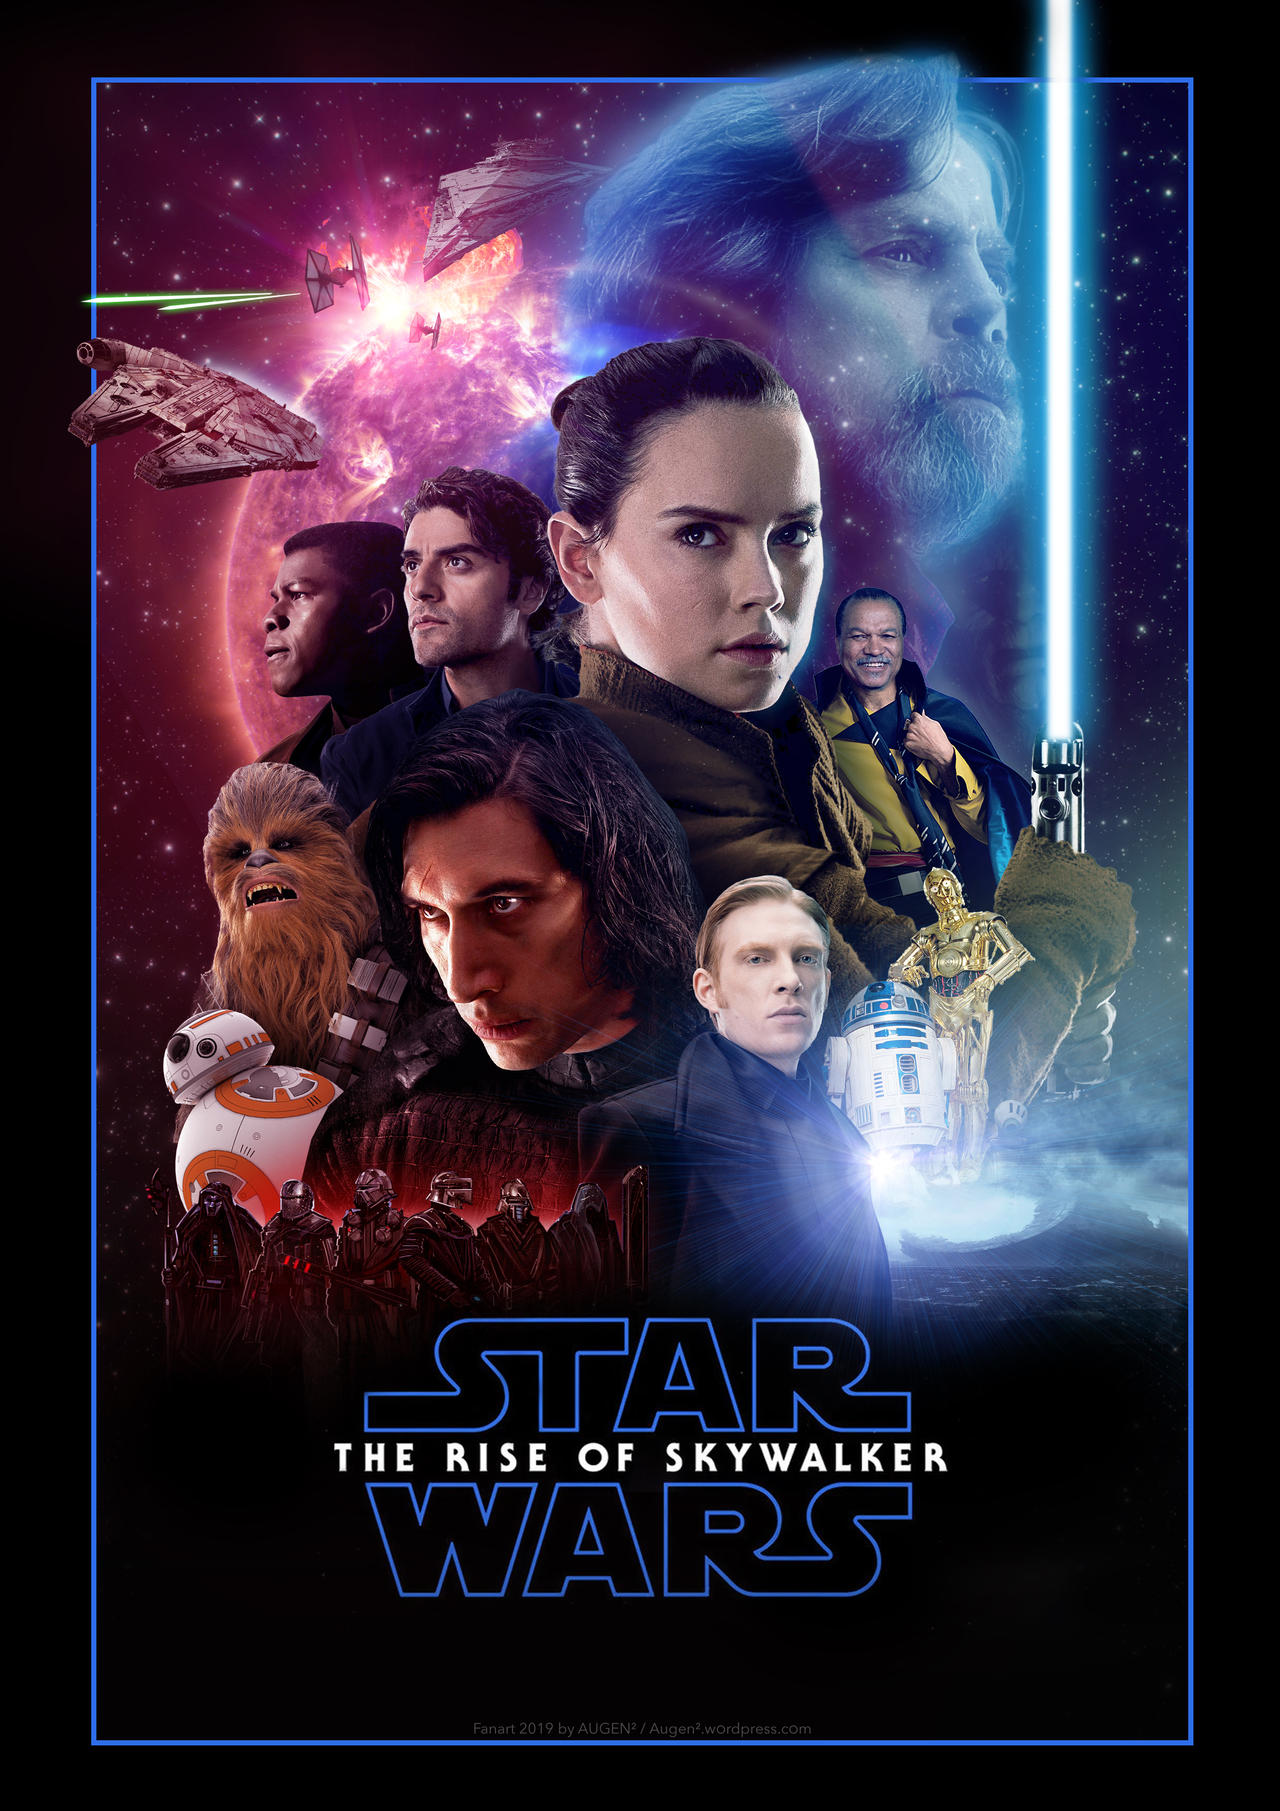 Star Wars The Rise Of Skywalker Fanart Poster By Uebelator On Deviantart